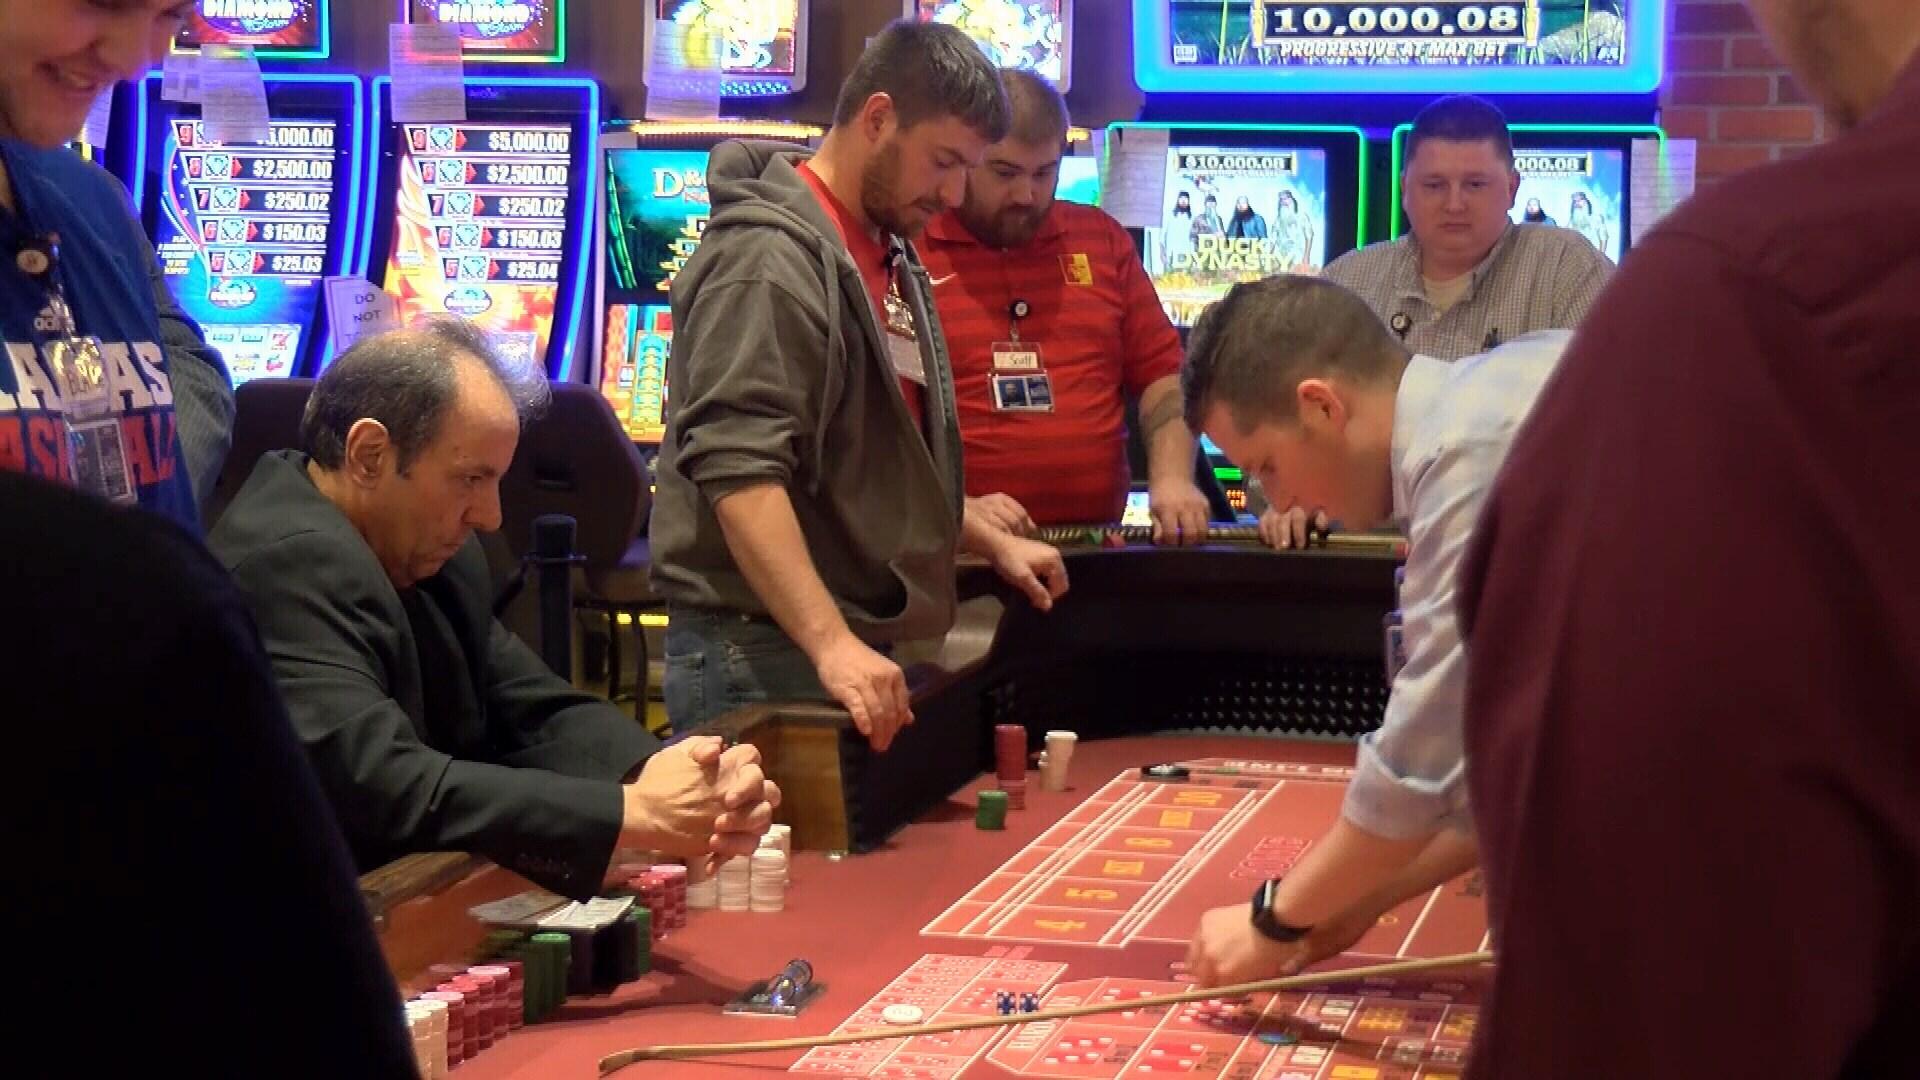 Casino layoffs u.s.tax treaty article canadian gambling income